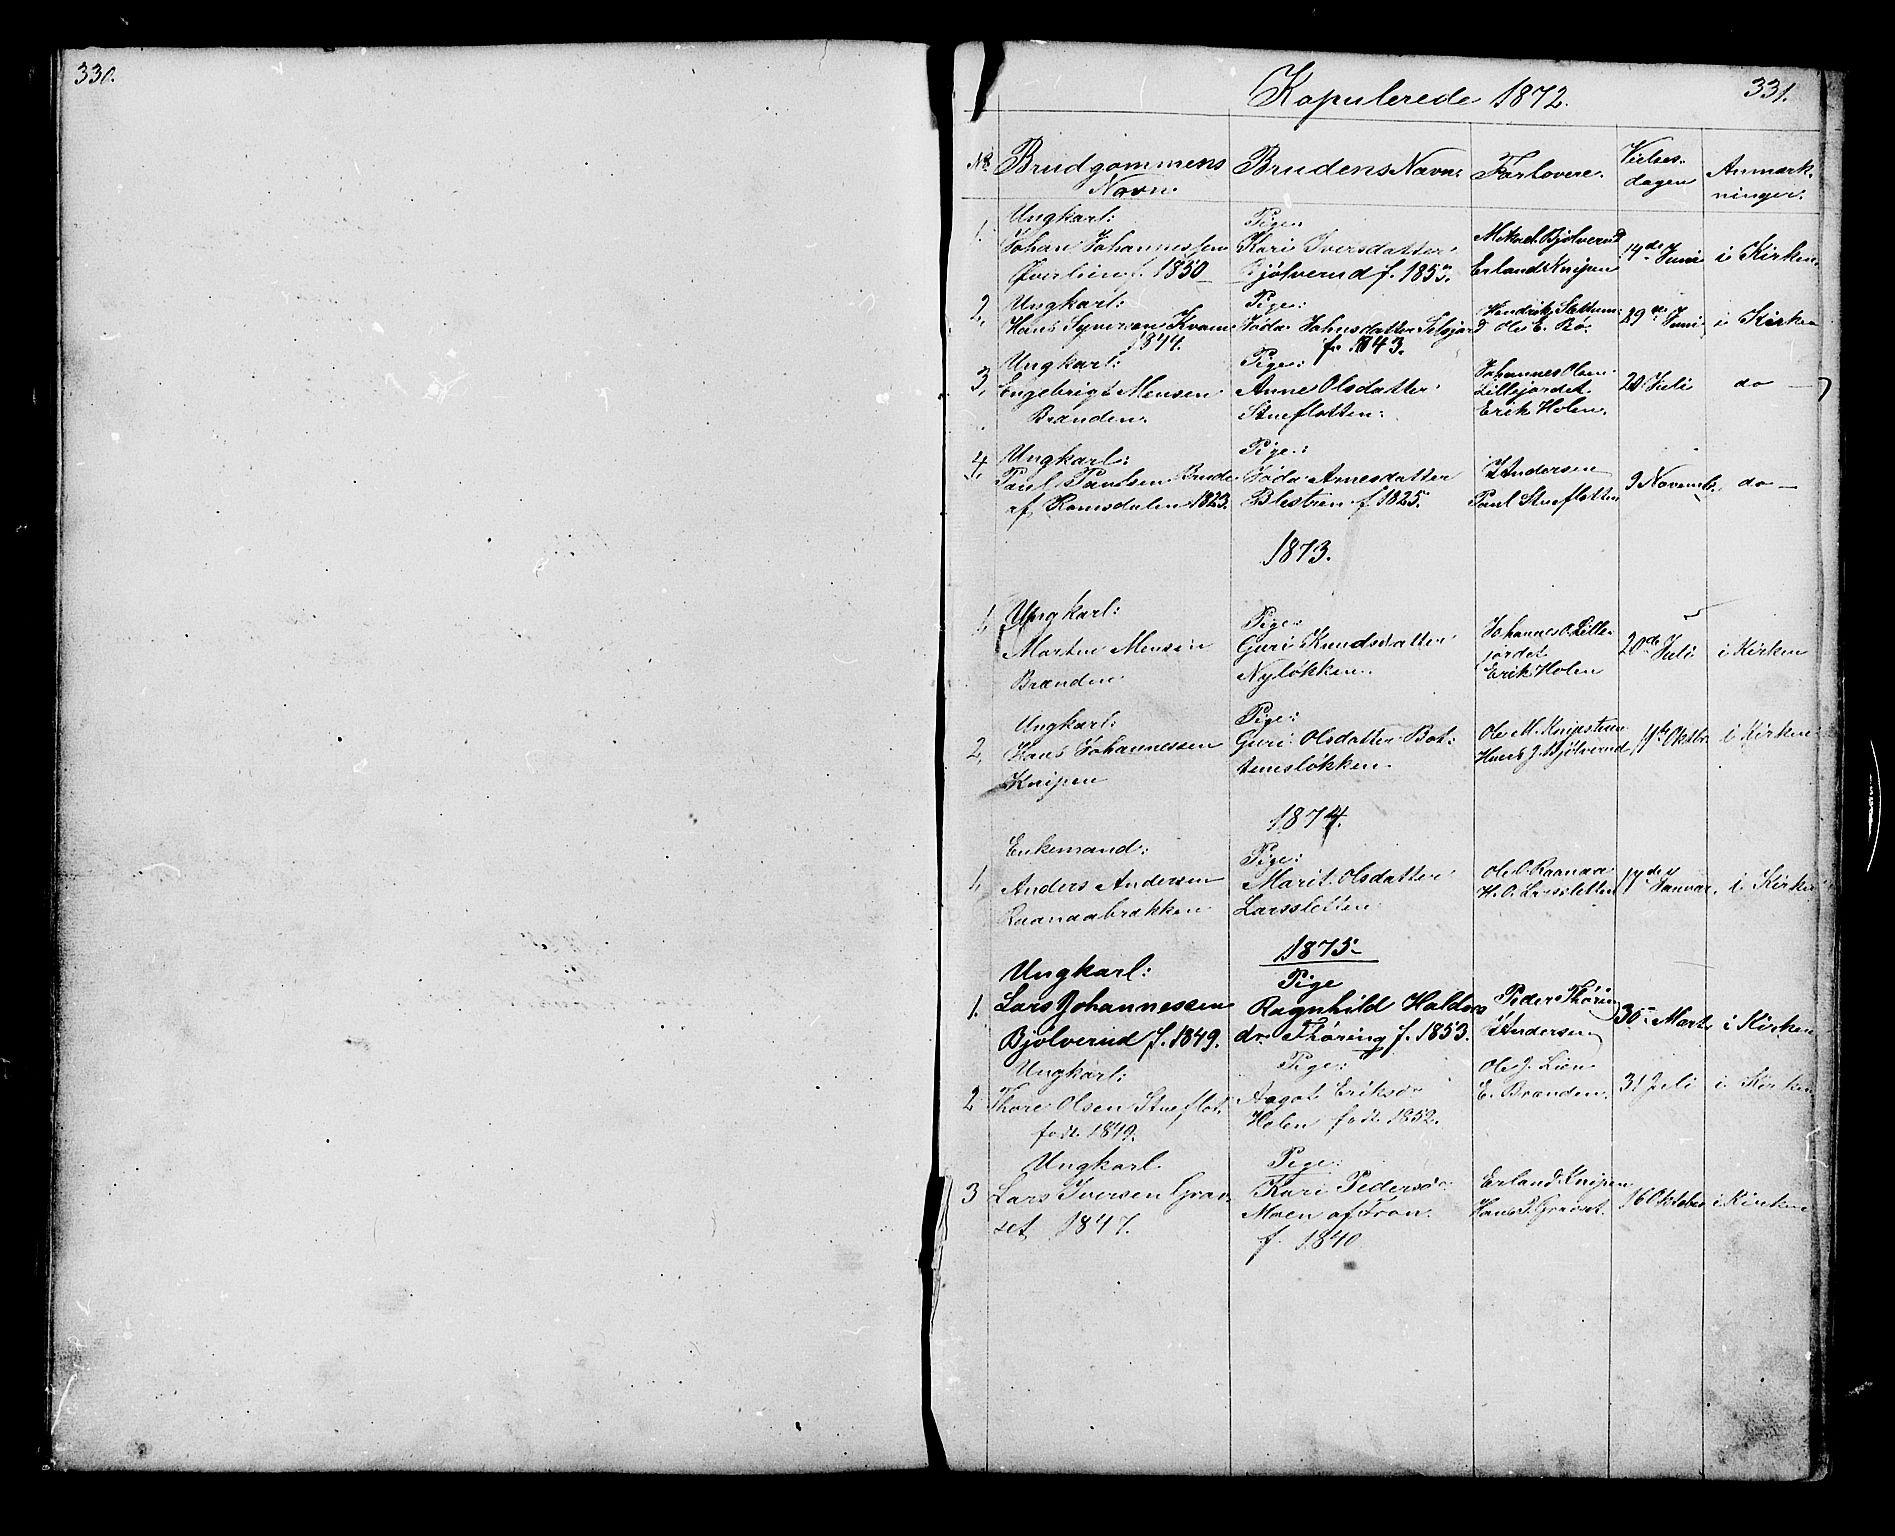 SAH, Lesja prestekontor, Klokkerbok nr. 6, 1871-1904, s. 330-331